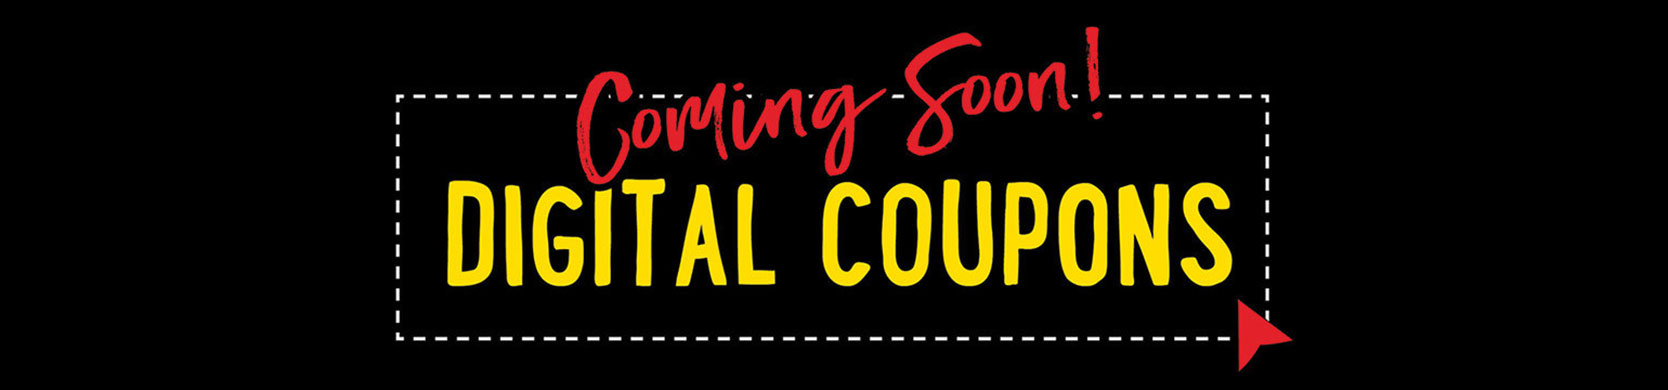 homeslide-Digital-Coupons-Coming-Soon